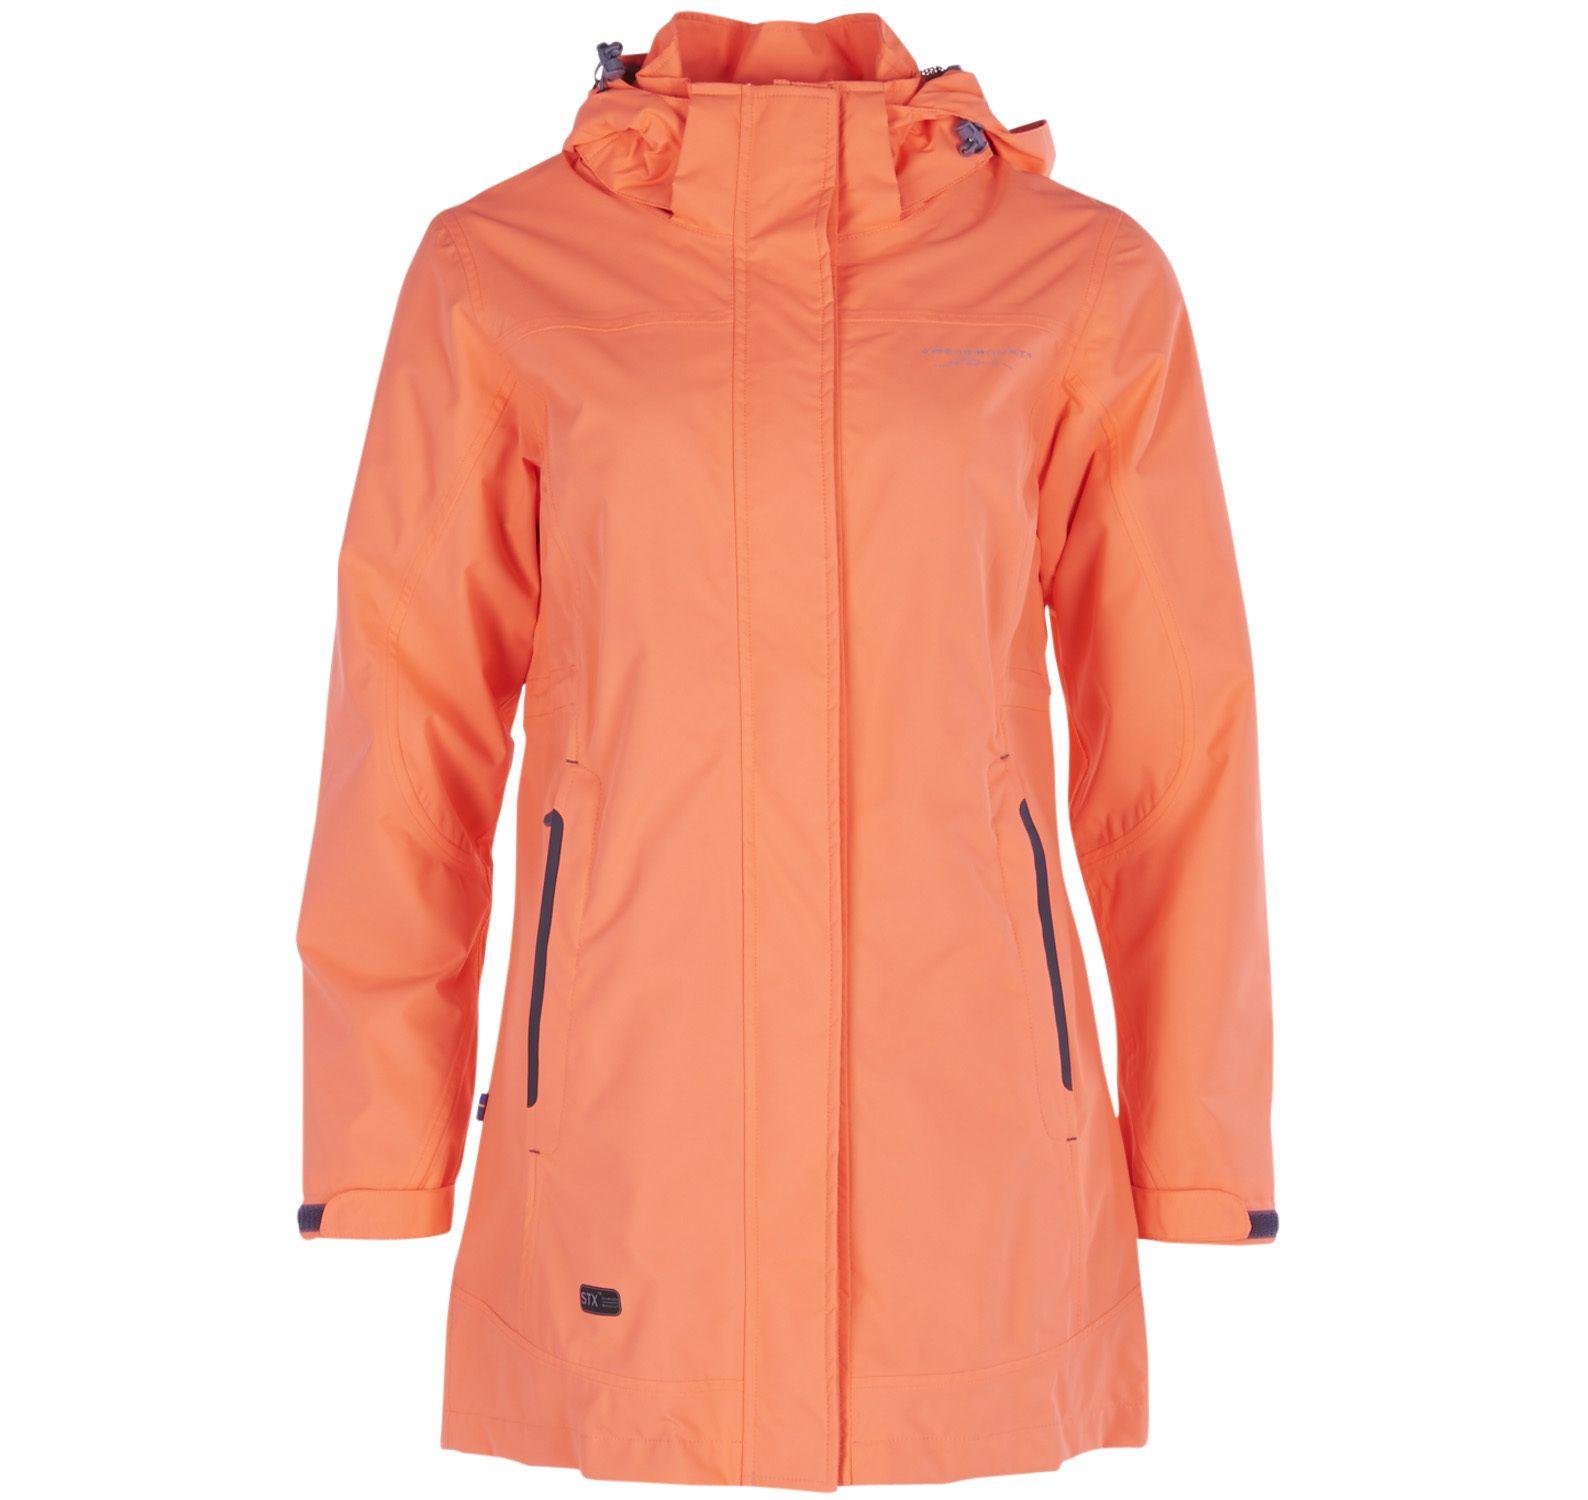 musö raincoat w, mango, 40, regnkläder